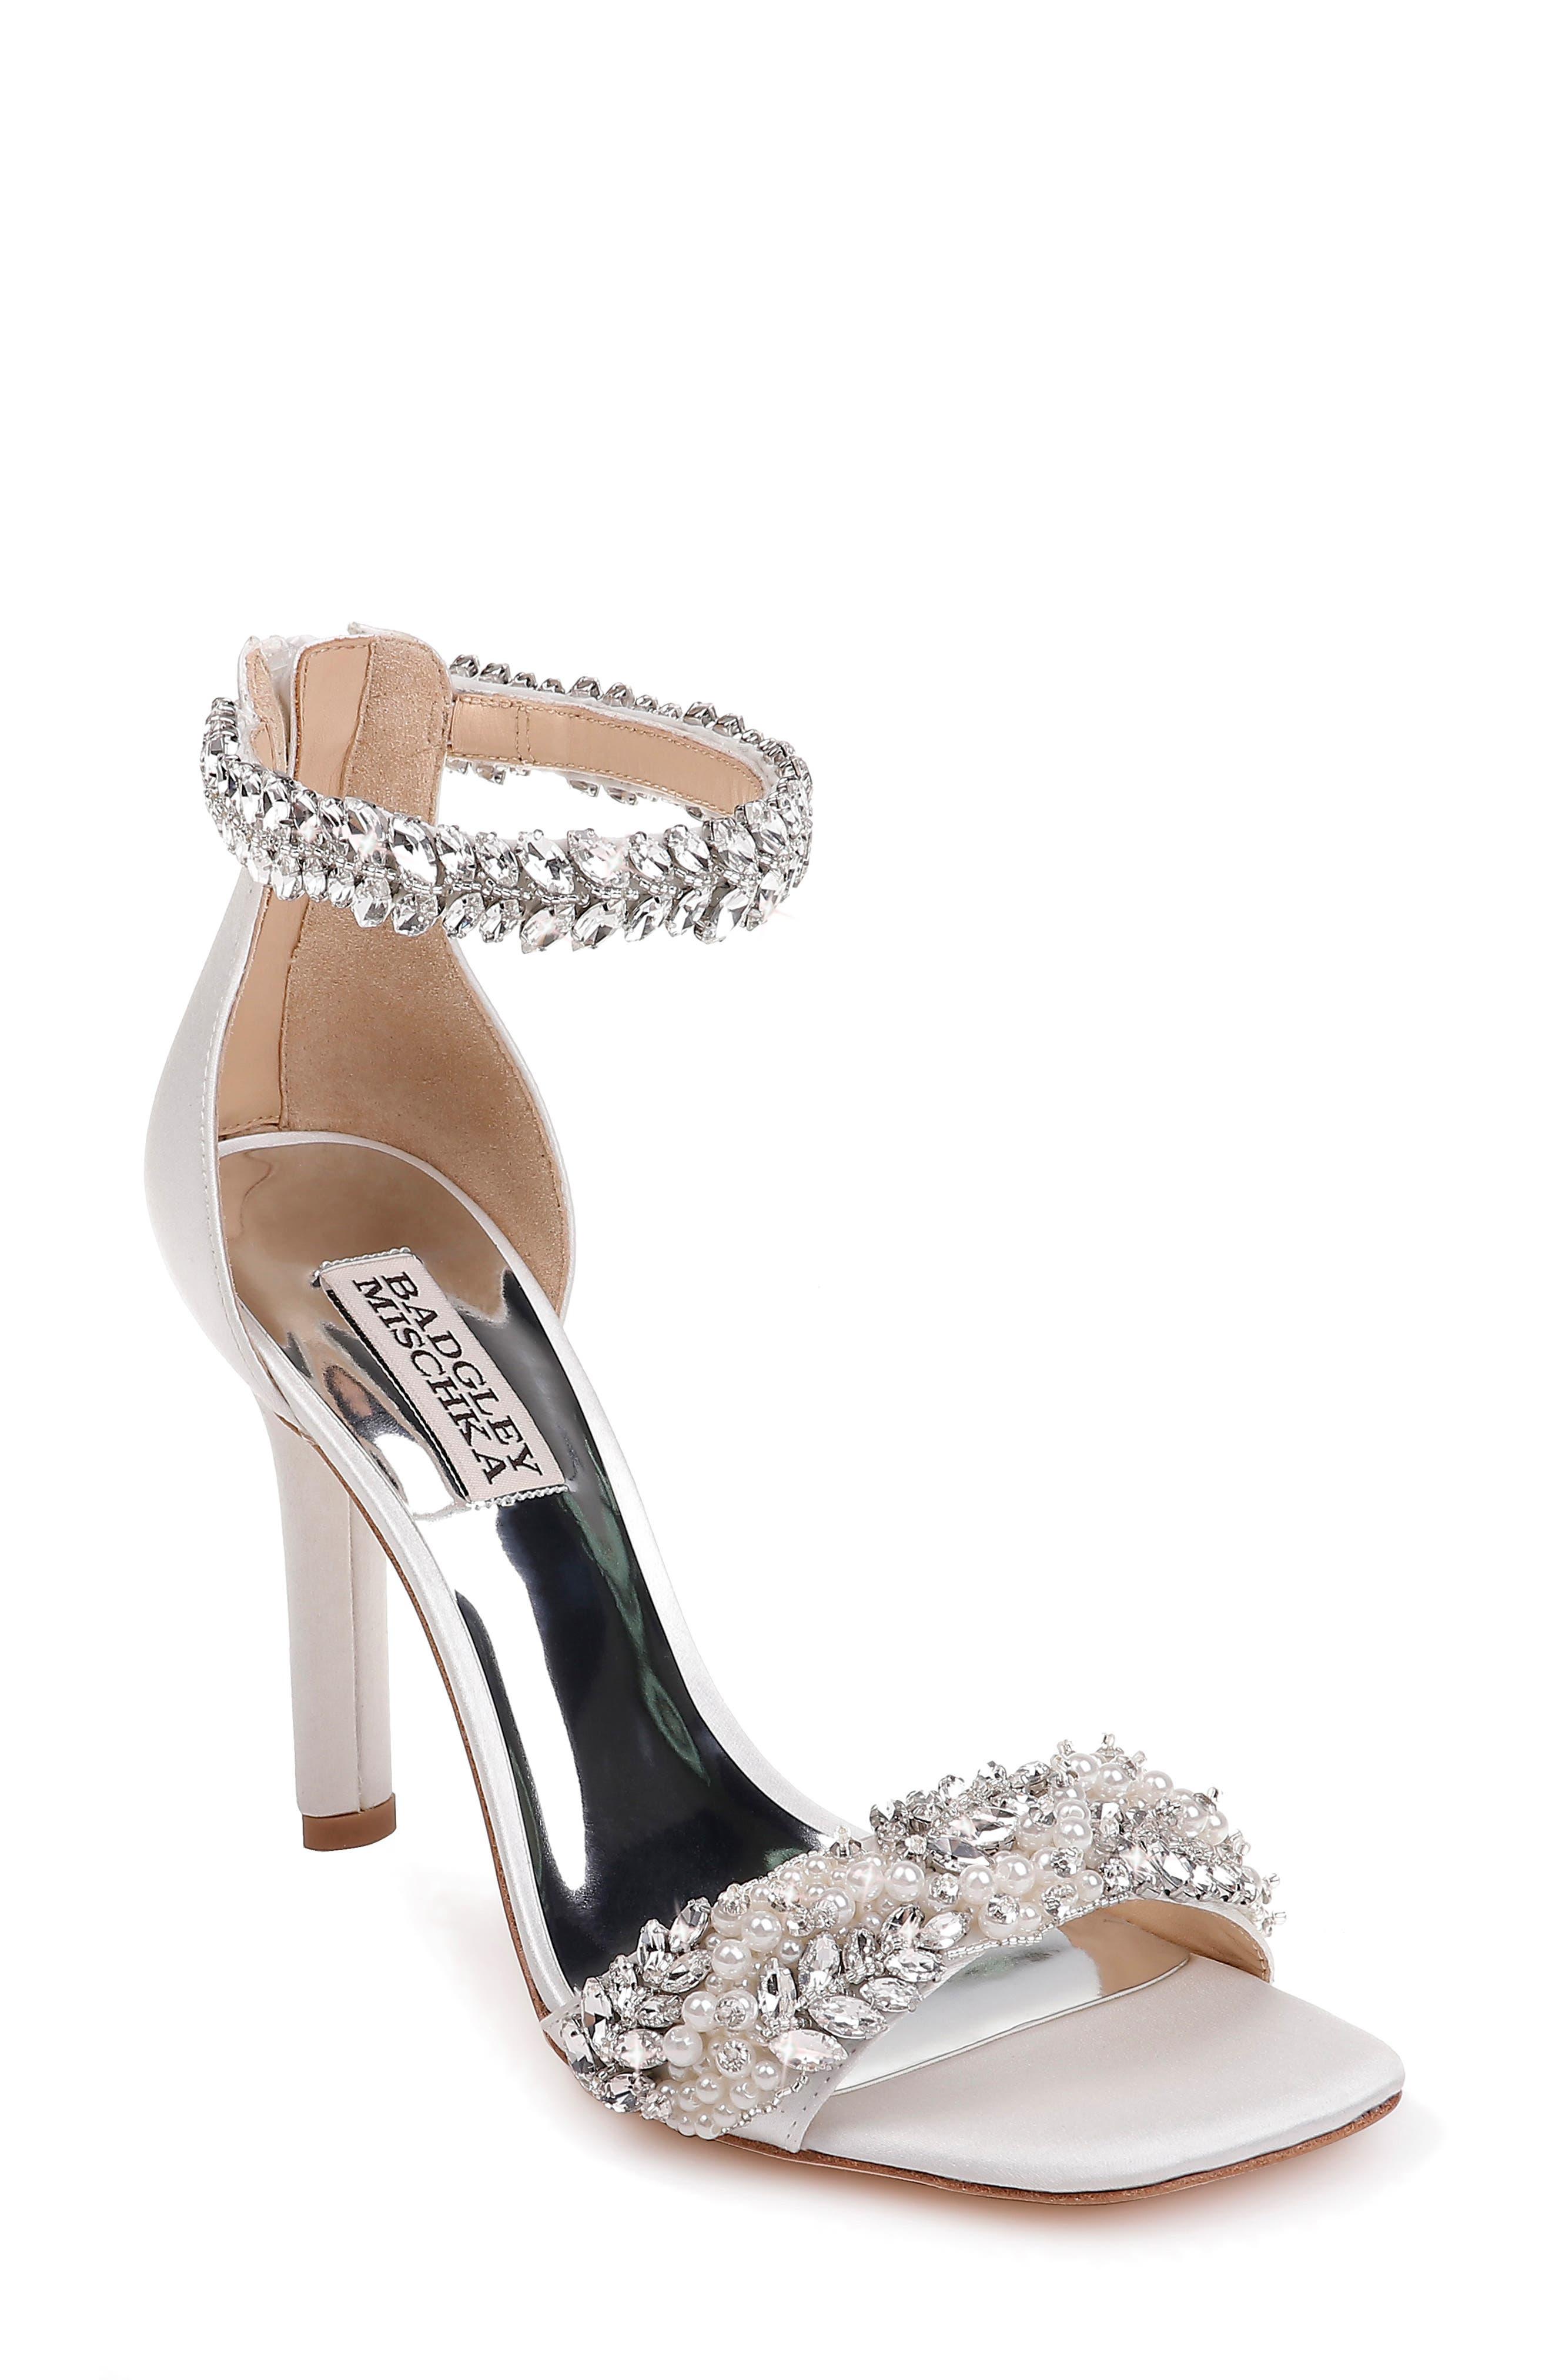 BADGLEY & MISCHKA Women'S Fiorenza Faux Pearl & Crystal Embellished High-Heel Sandals in Soft White Satin